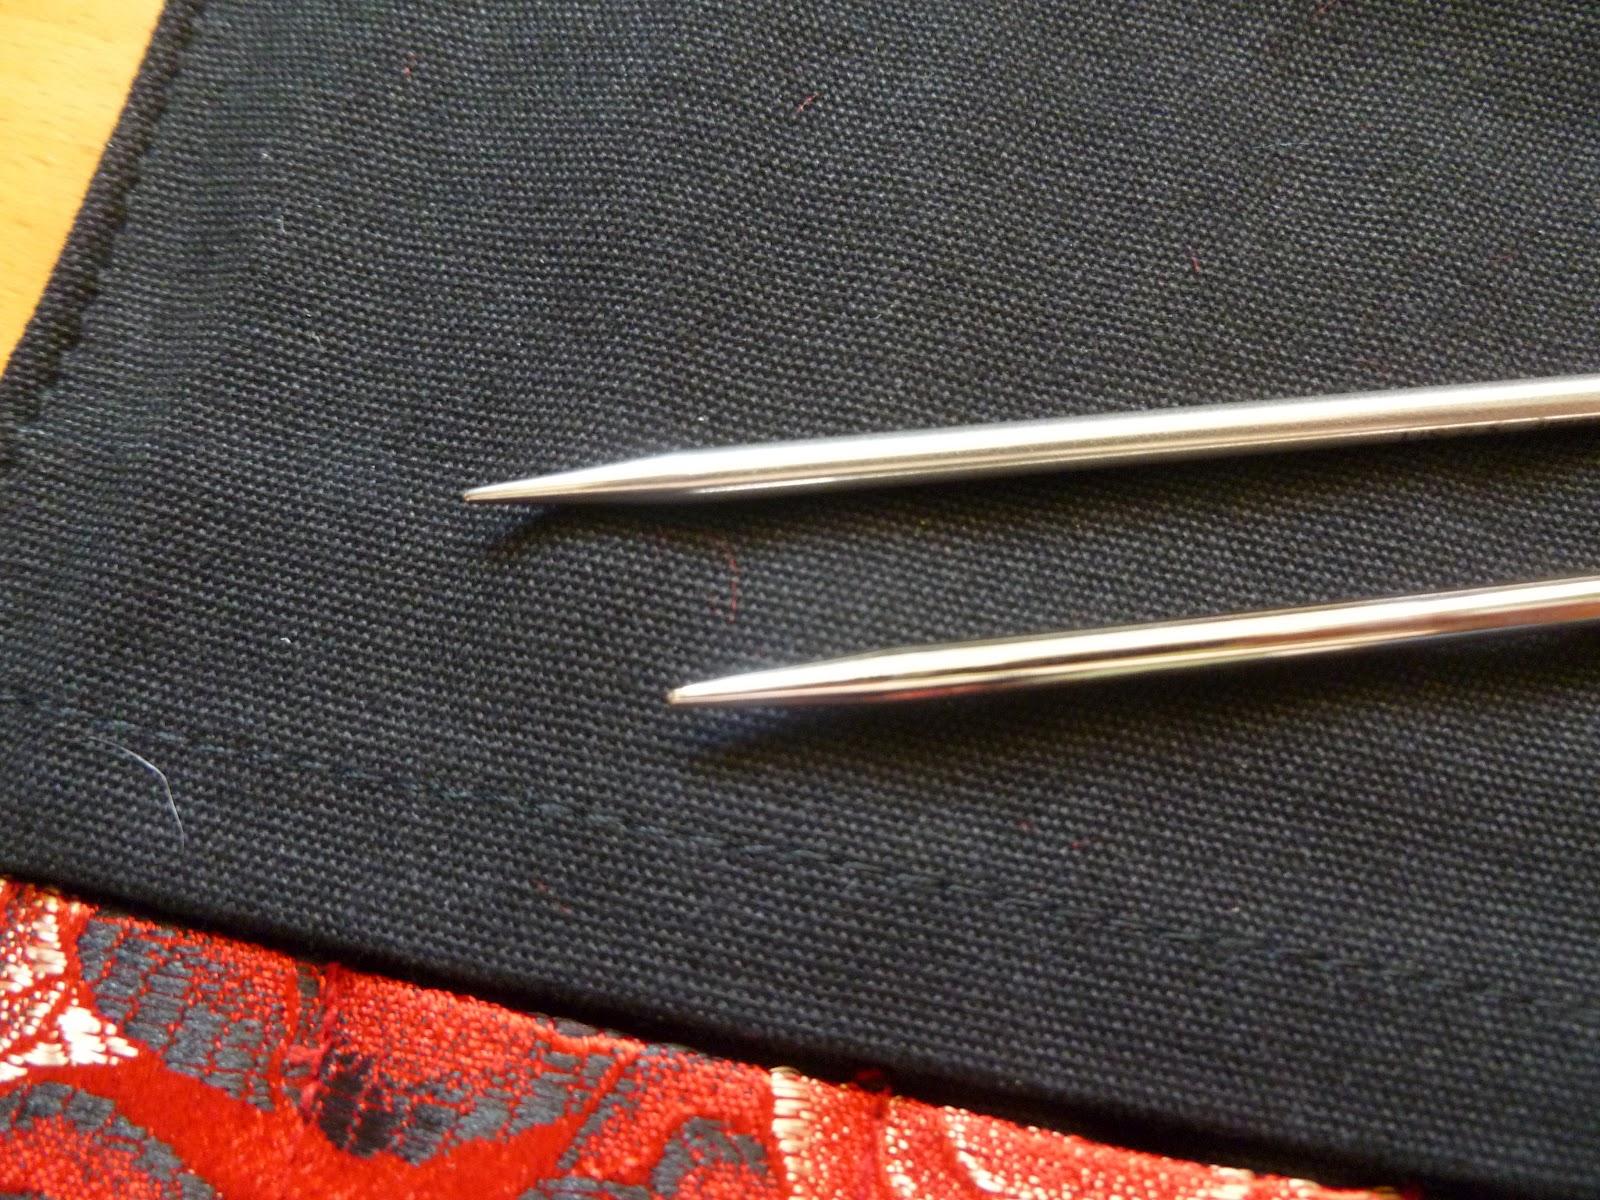 sdmags: Hiya Hiya Sharp Interchangeable Needles